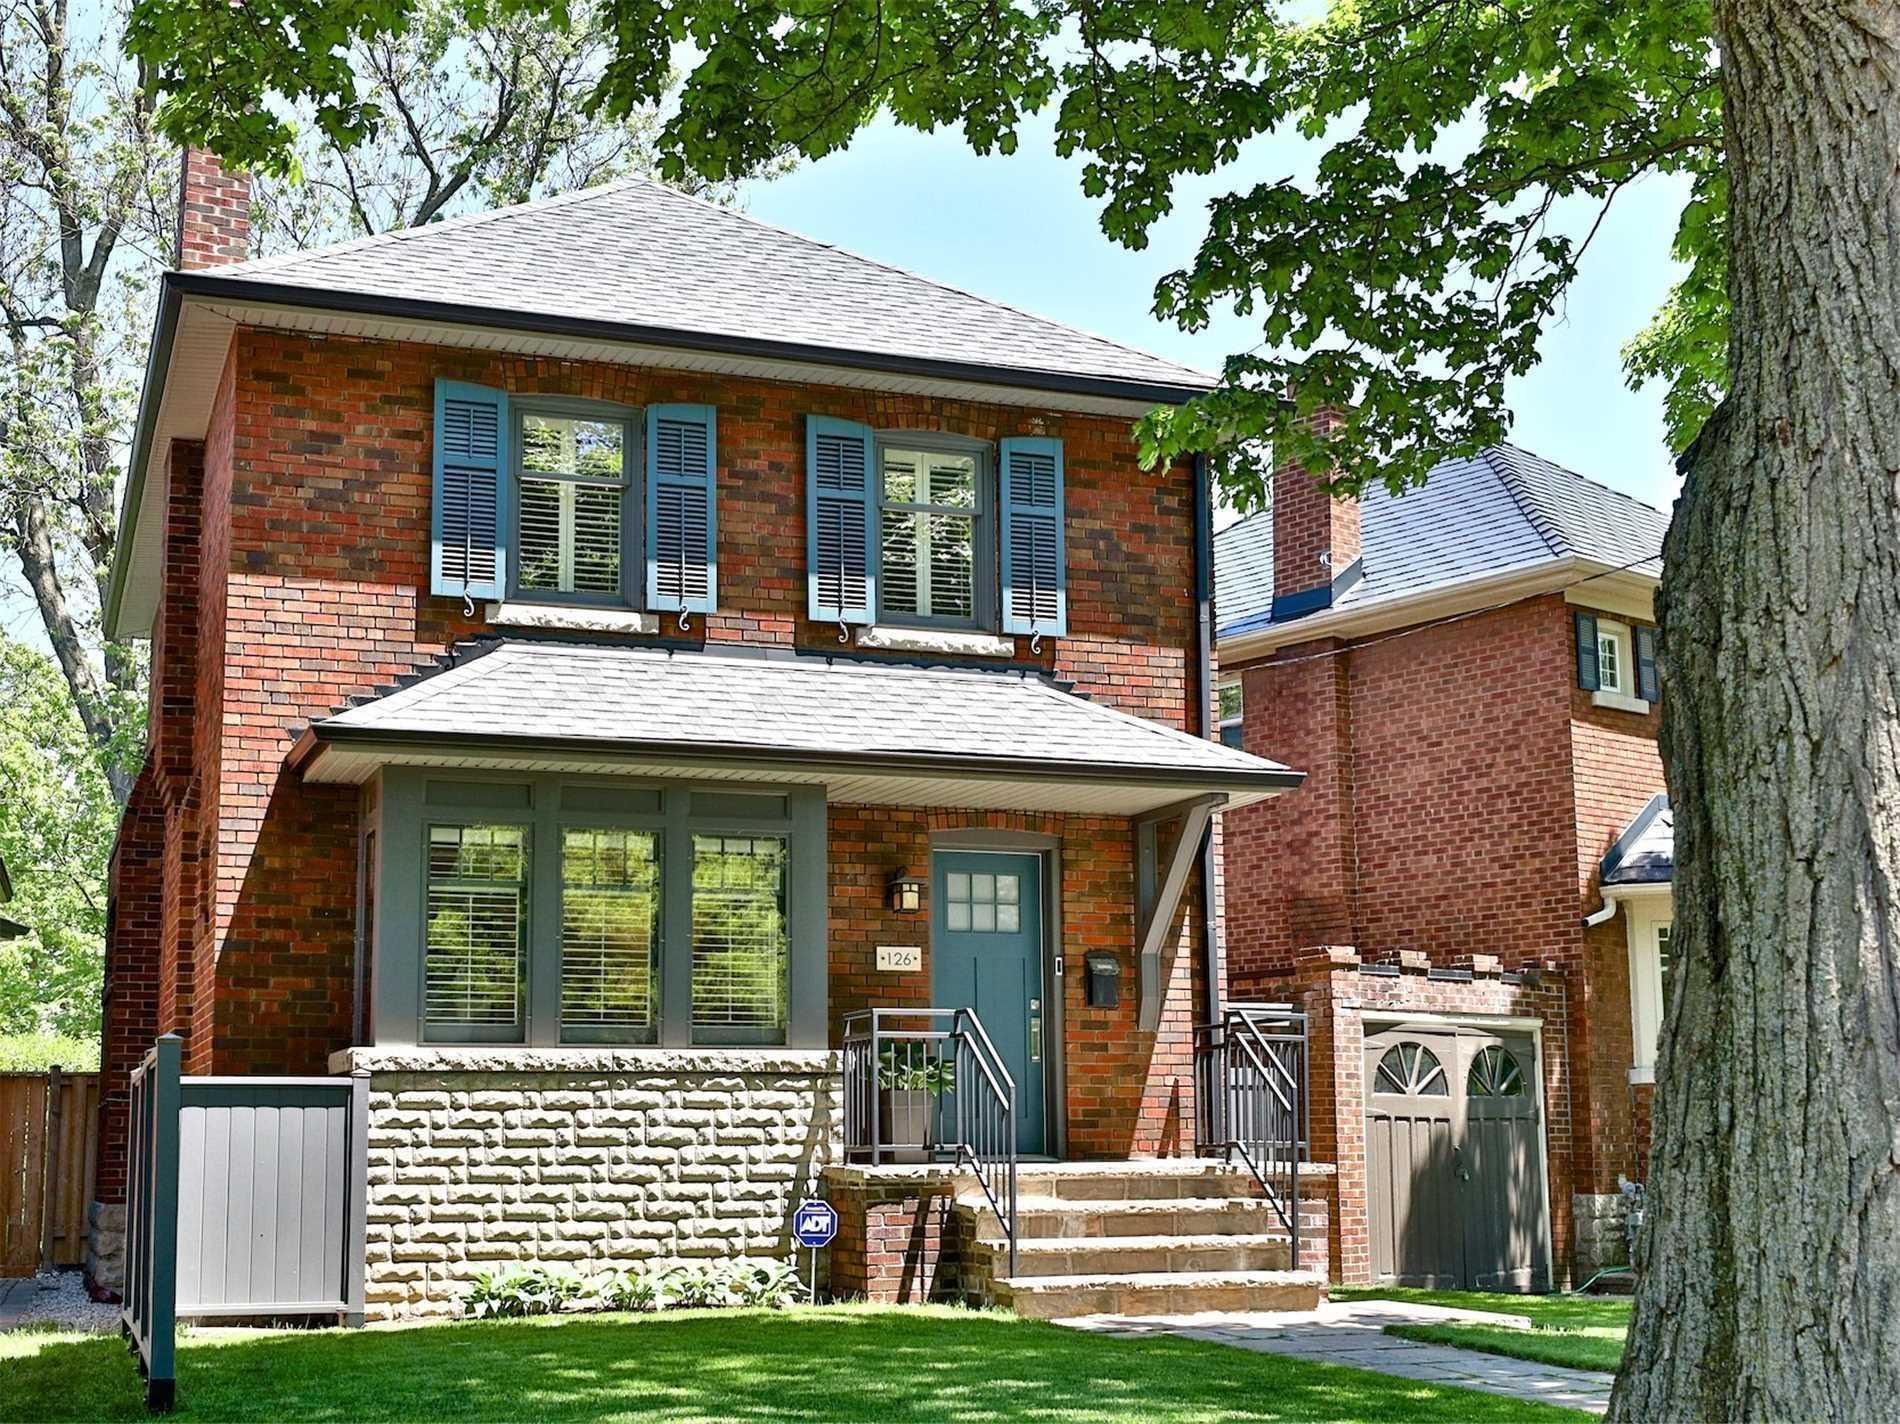 126 Chatsworth Dr, Toronto, M4R1R9